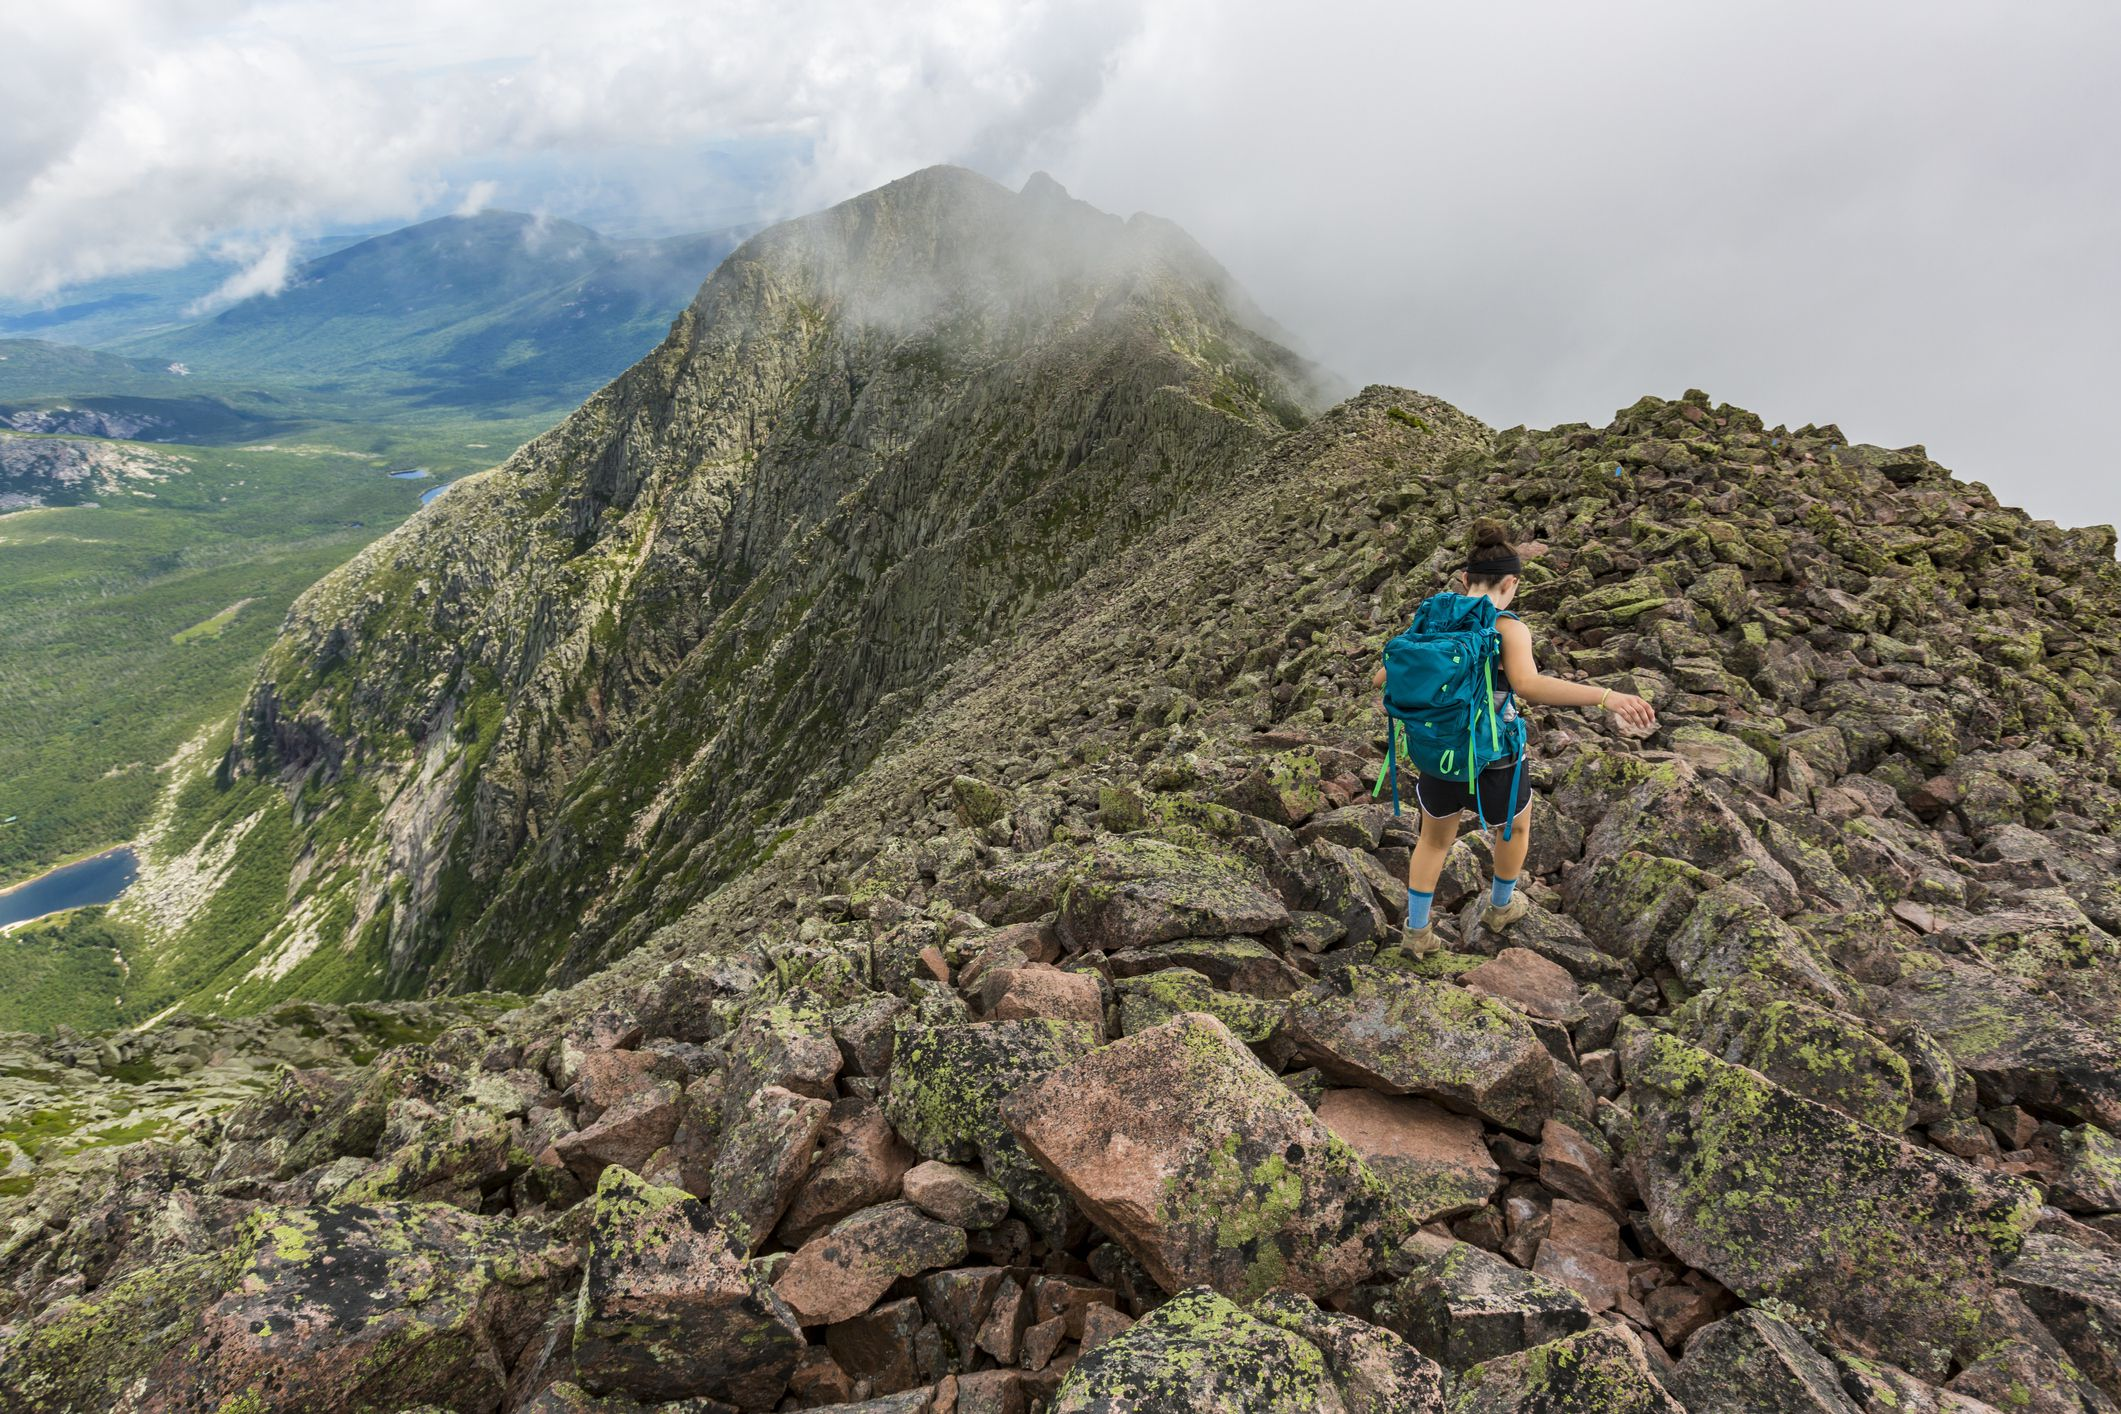 Teenage girl hiking along mountain ridge at Knife Edge Trail on Mount Katahdin in Baxter State Park, Maine, USA